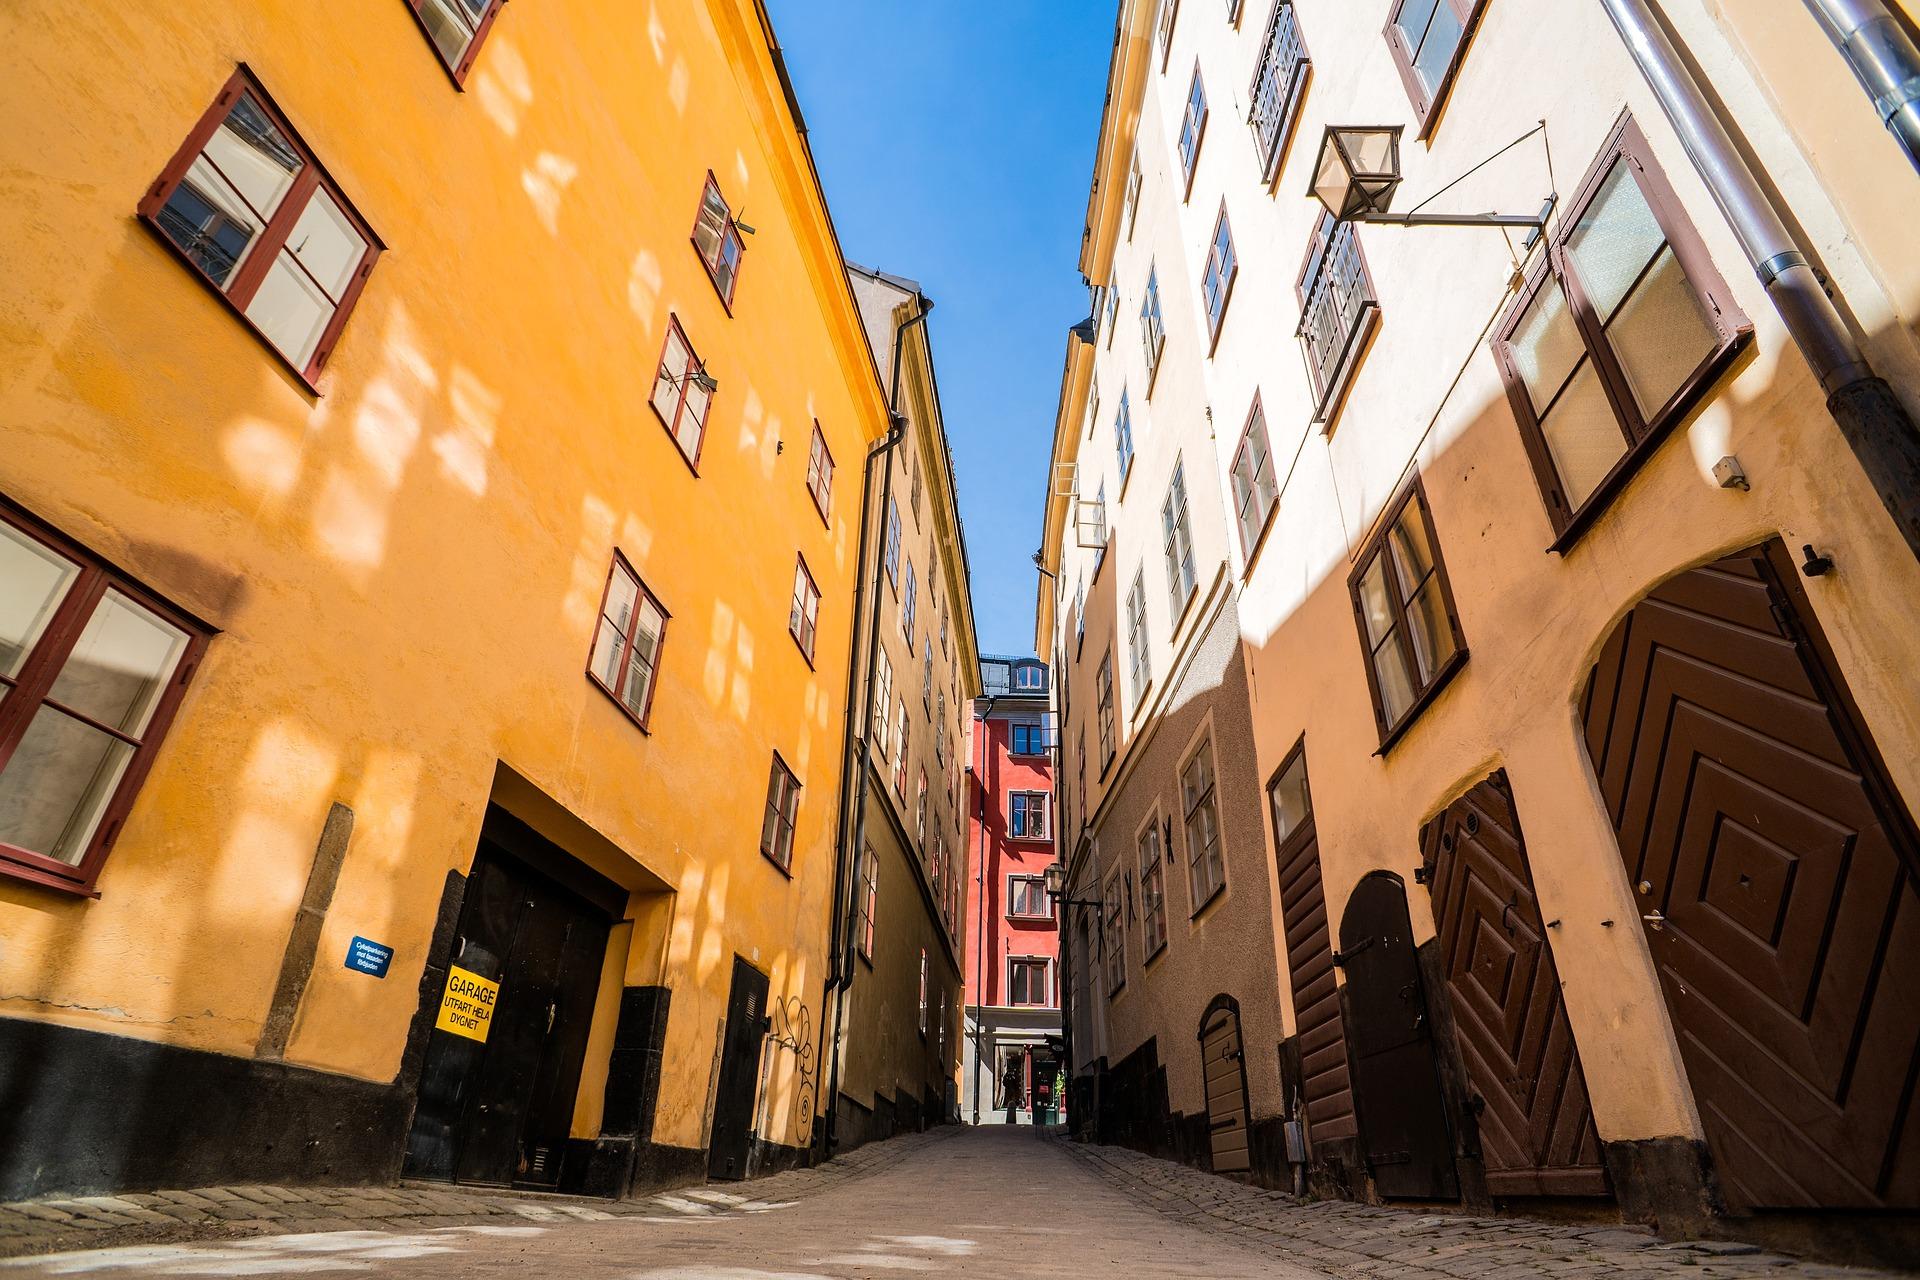 Klottersanering i Gamla stan igen – Stockholm